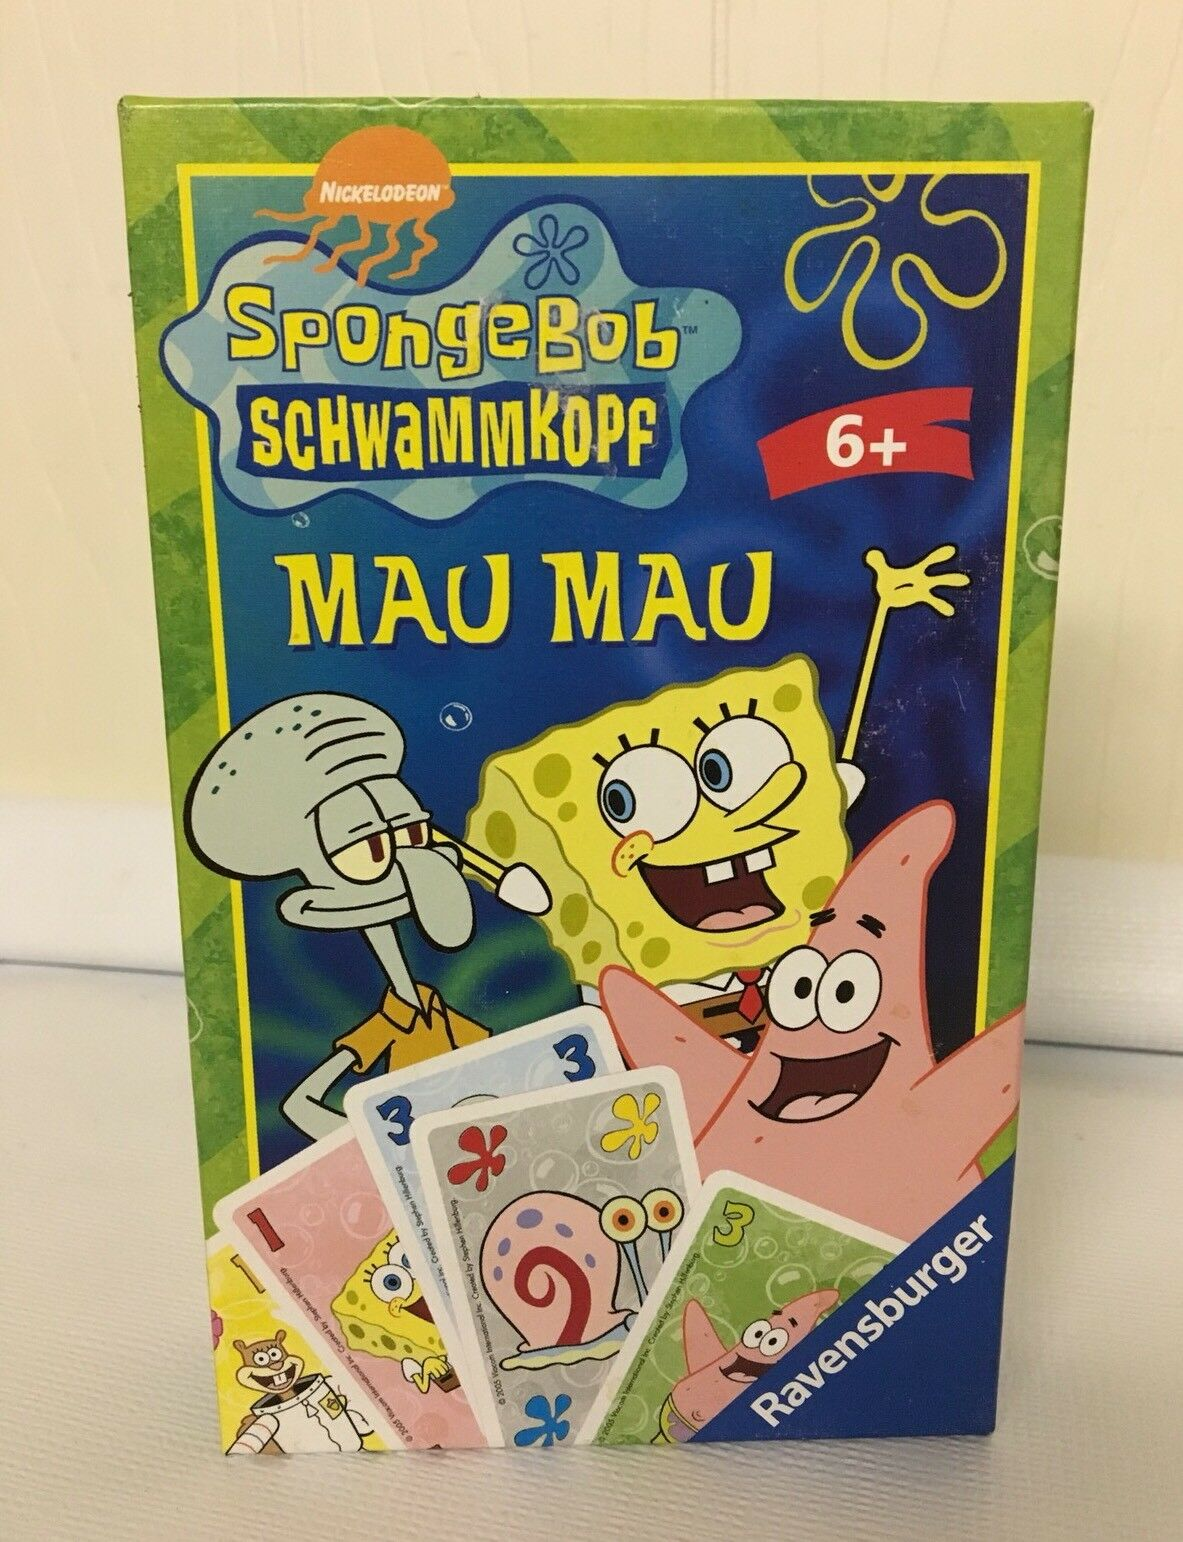 Spongebob Schwammkoff Mau Mau Card Game Ravensburger SEALED German Uno Crazy 8s